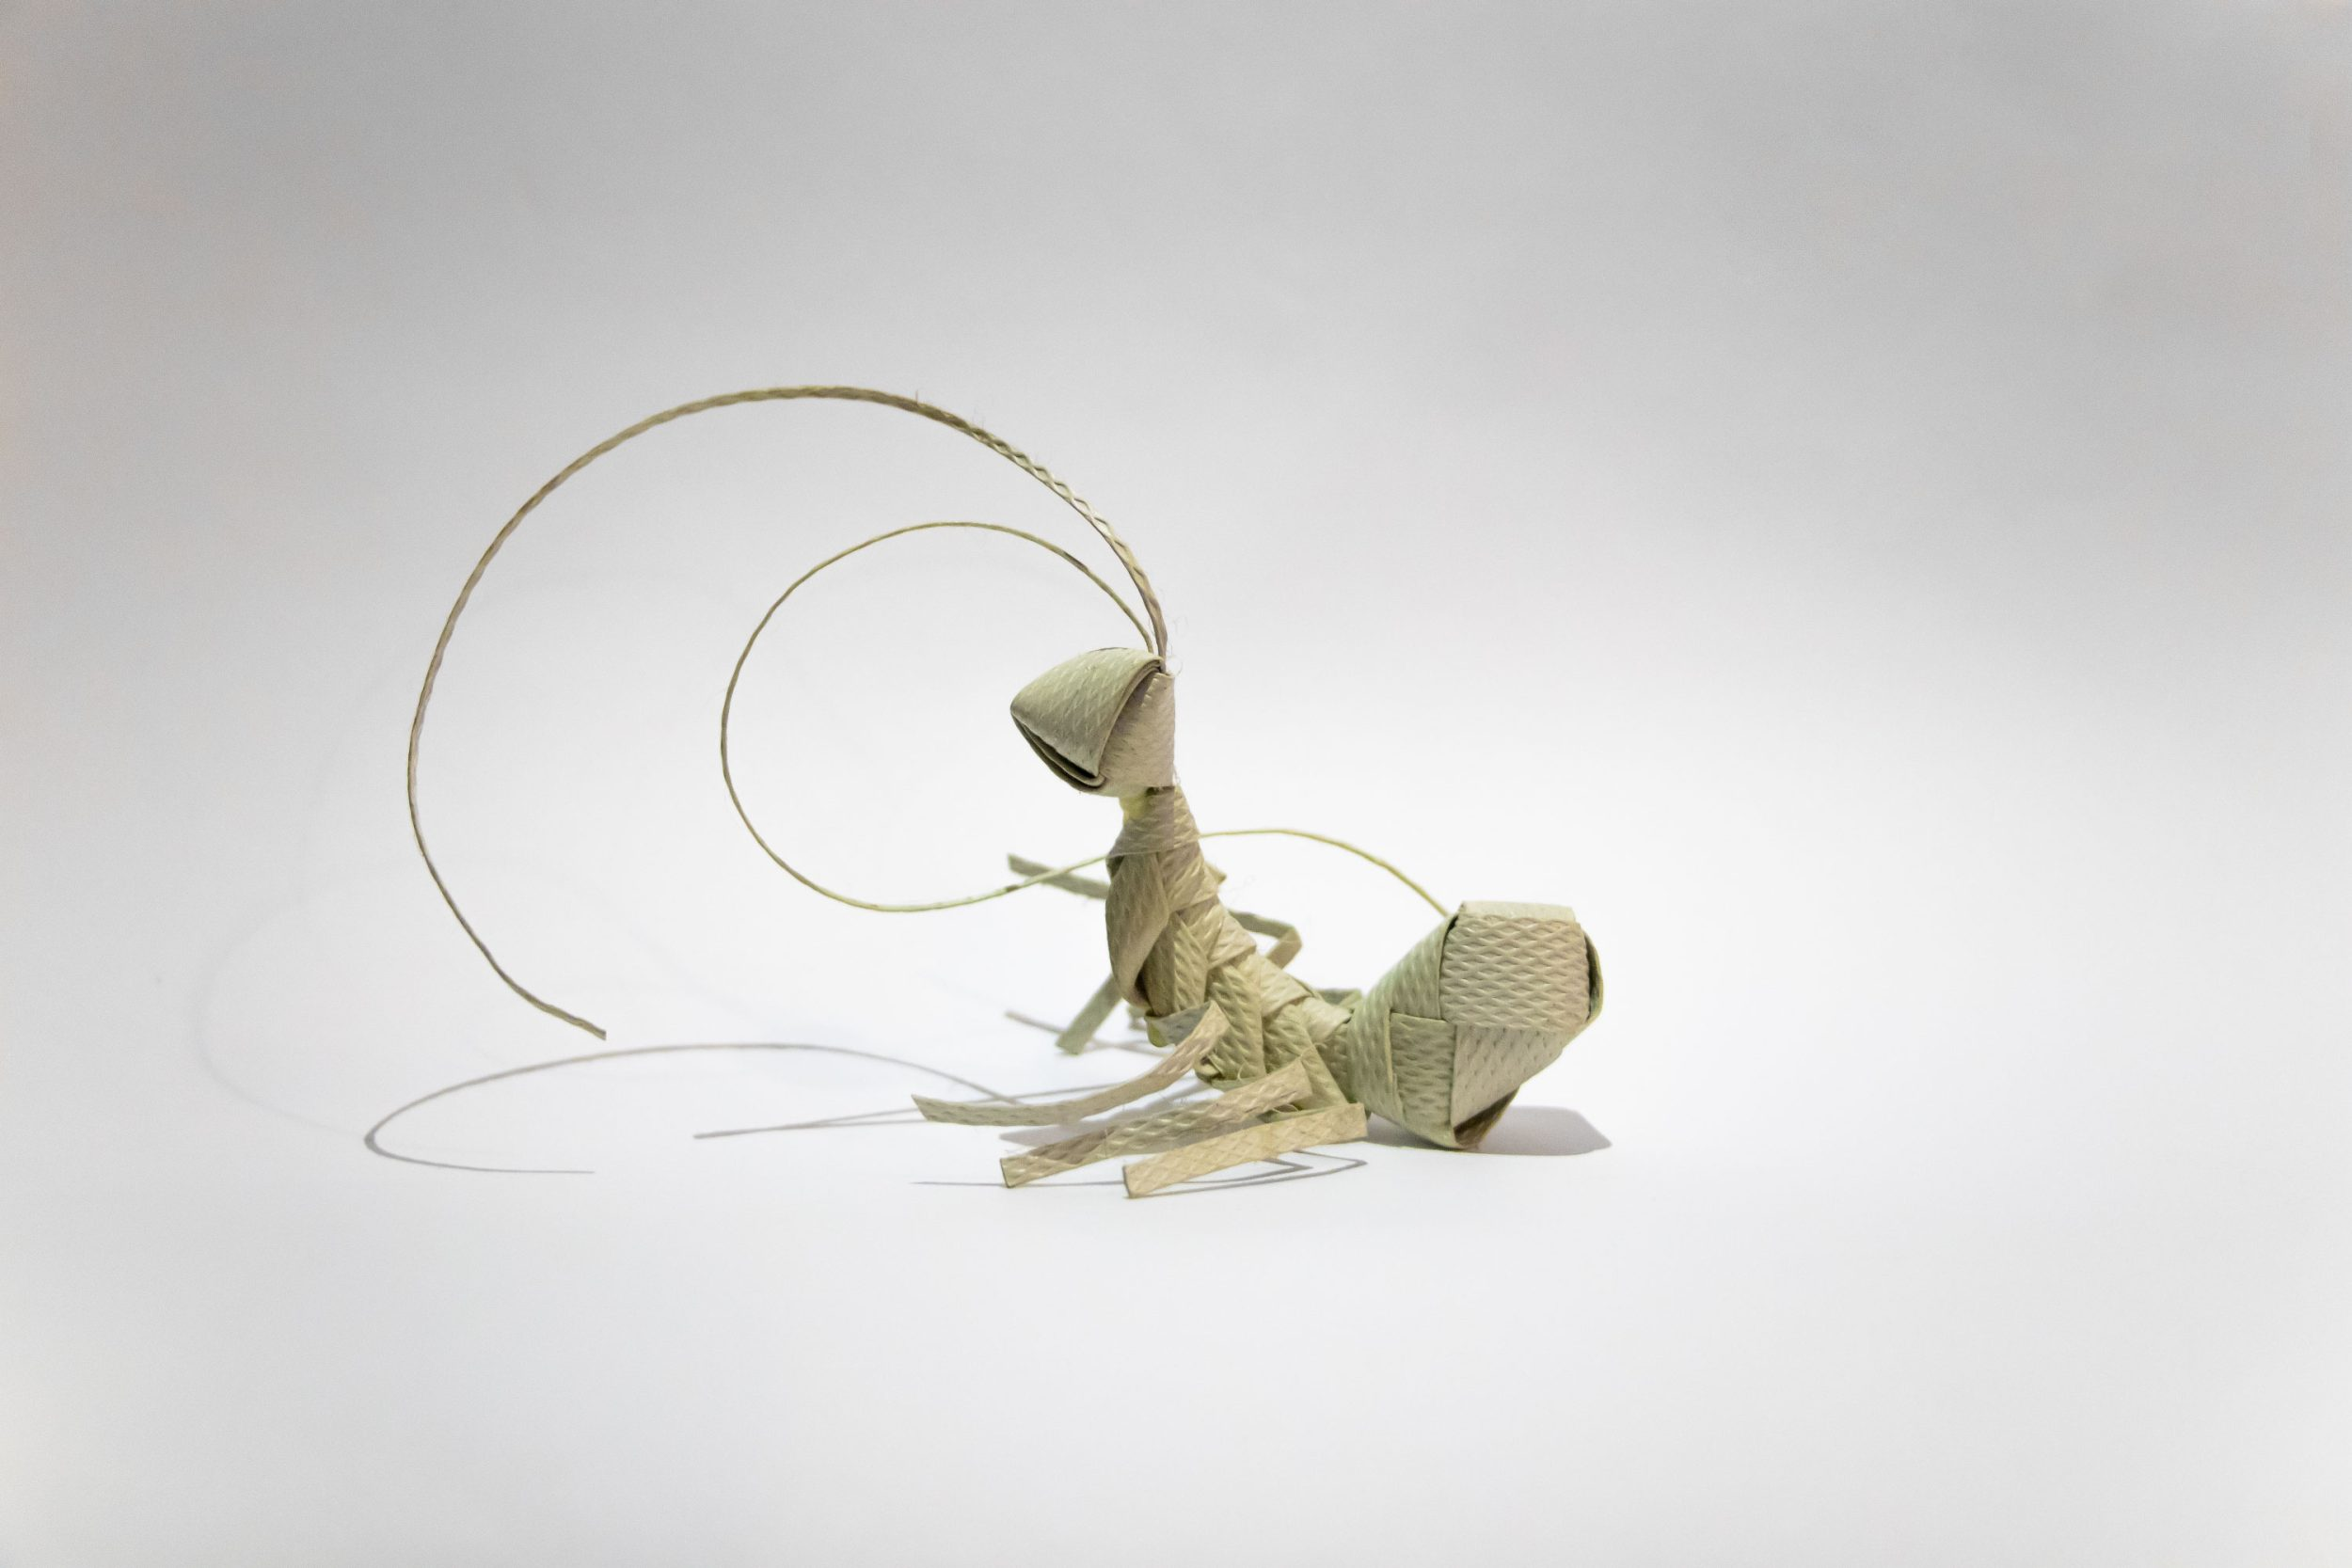 Ant-web